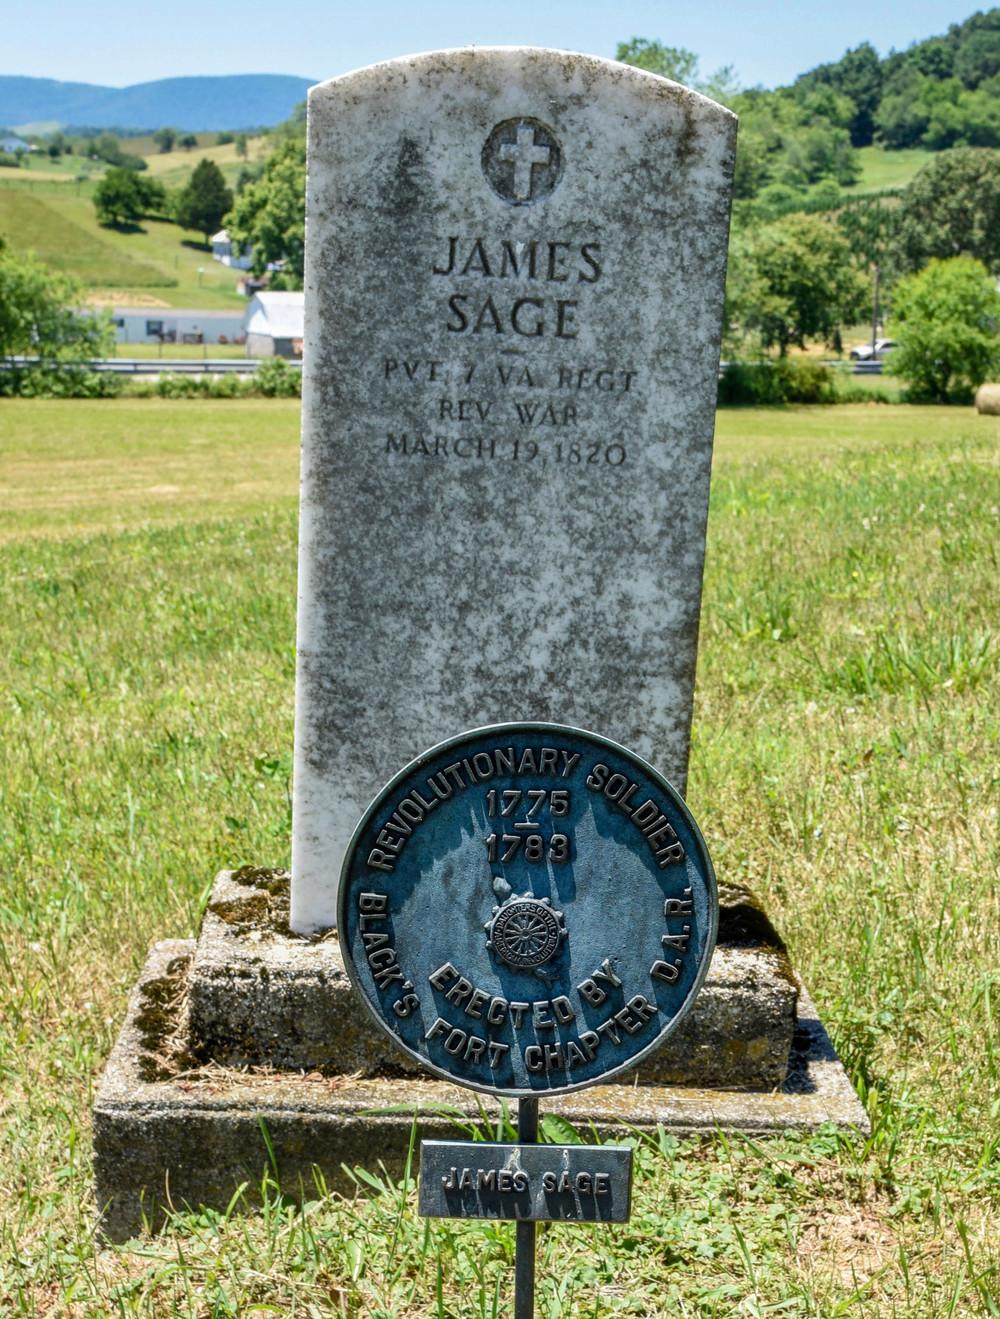 James Sage Grave Marker. Elk Creek, VA. Grayson County.